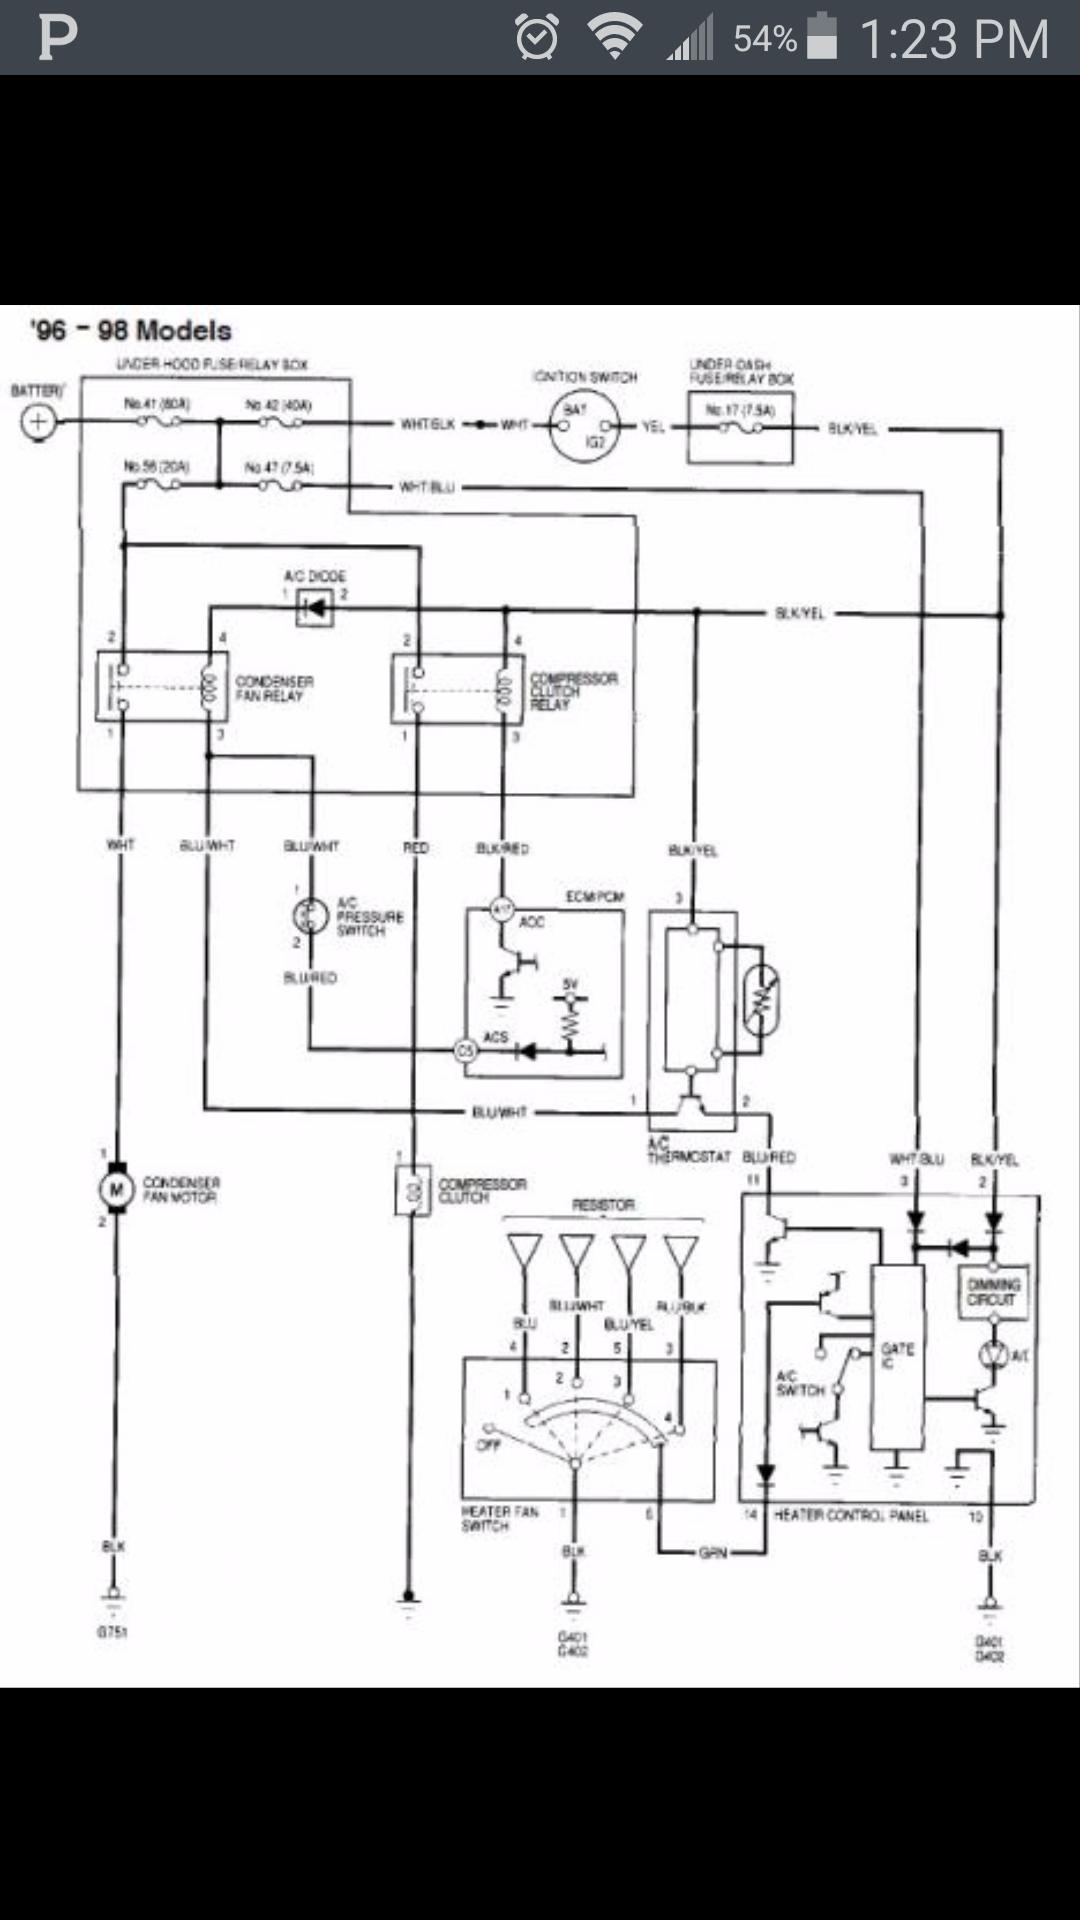 [SCHEMATICS_4PO]  No ac!! Heater control panel?? - Honda-Tech - Honda Forum Discussion | 96 Civic Climate Control Wiring Diagram |  | Honda-Tech